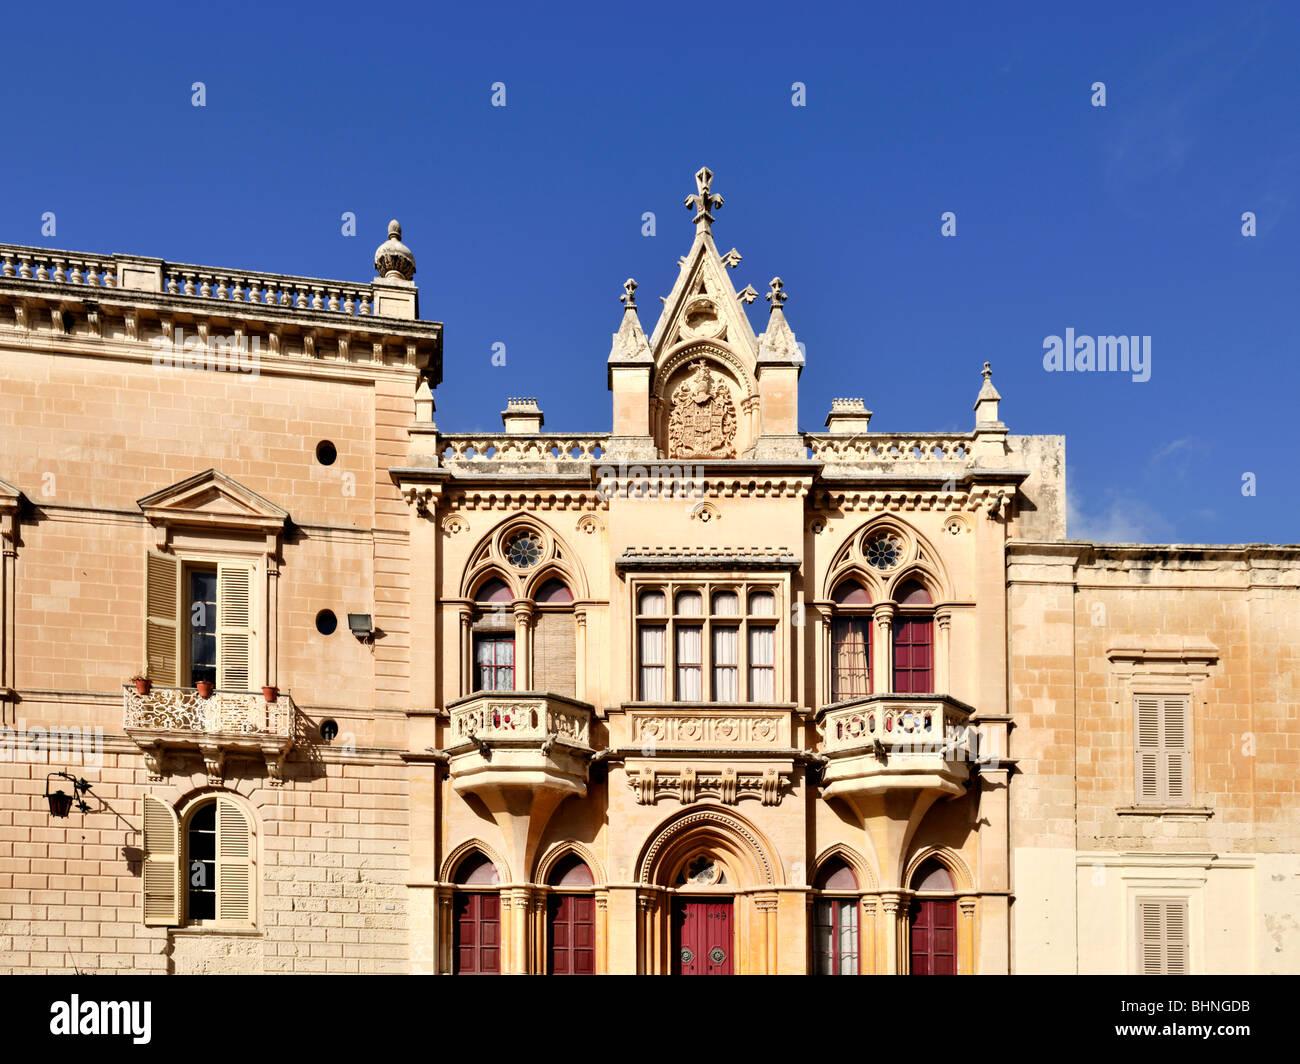 Baroque Facade, Pjazza San Pawl, Mdina - Stock Image